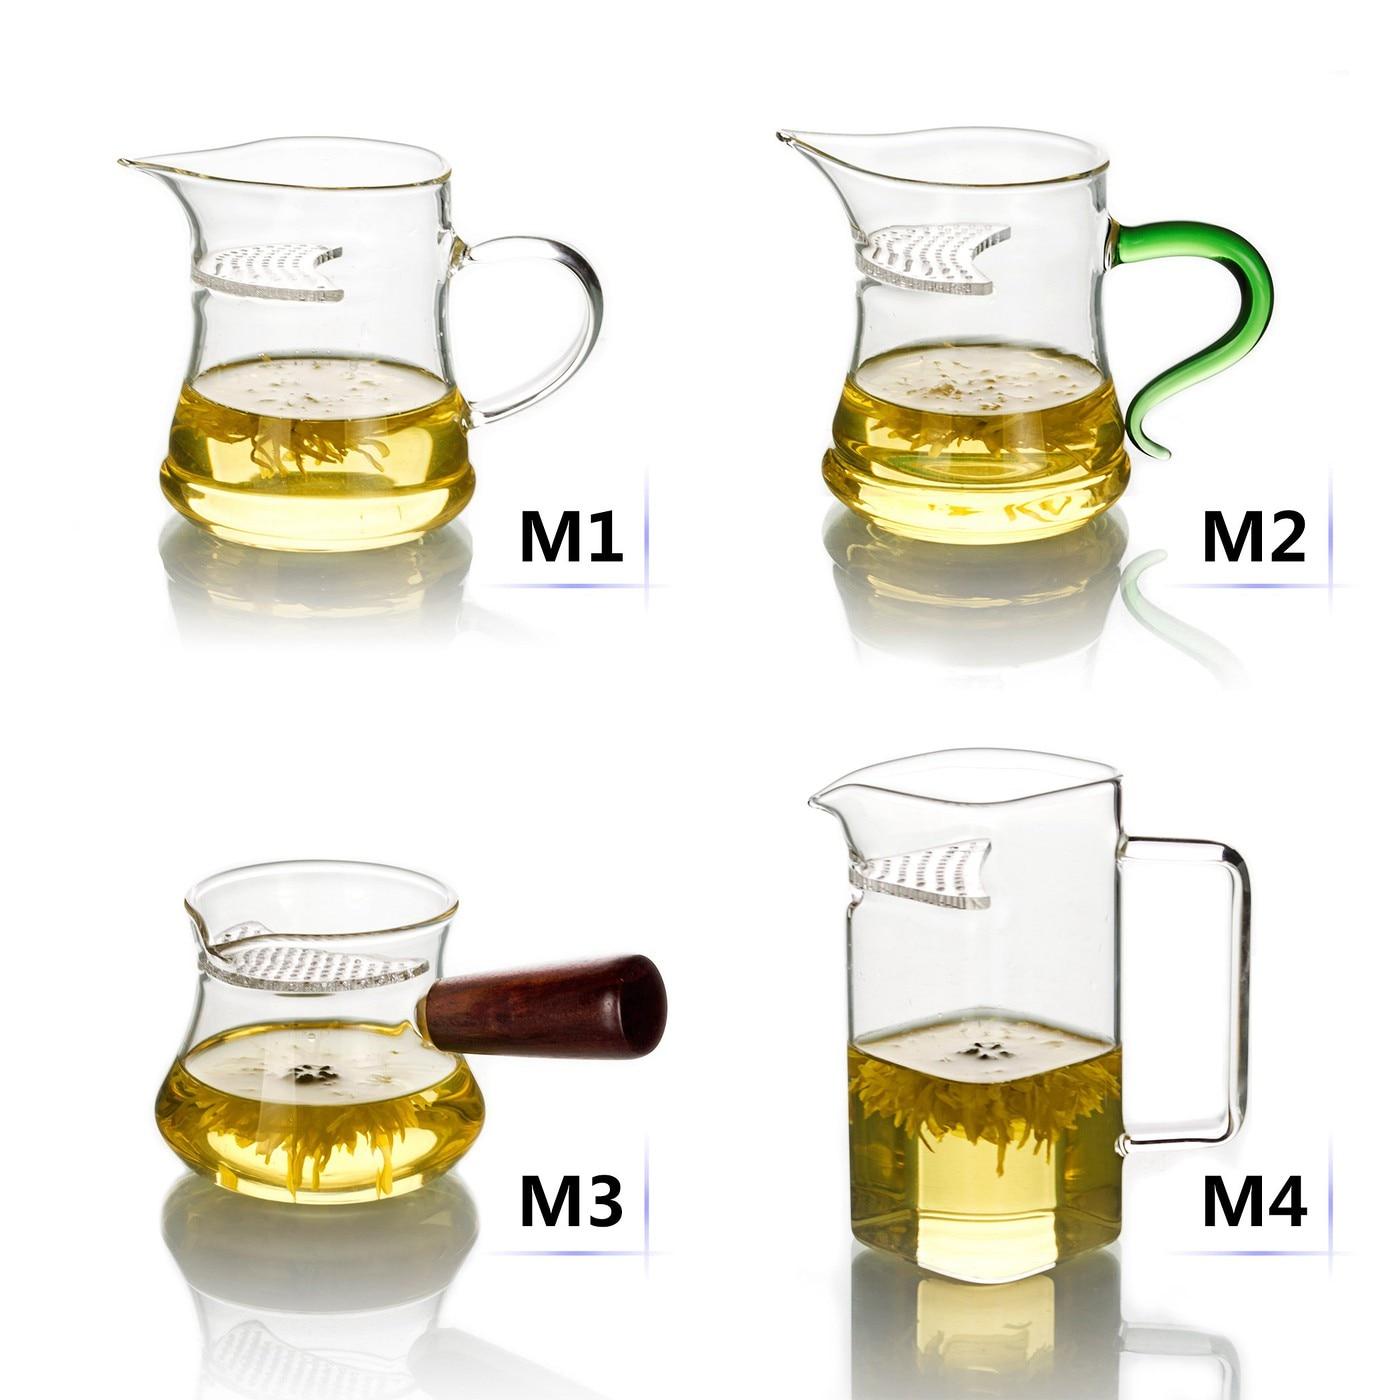 Kinds Heat-resistant Clear Glass Tea Pitcher Built-in Filter With Handle Handmade Fair Mug Cha Hai Teacup